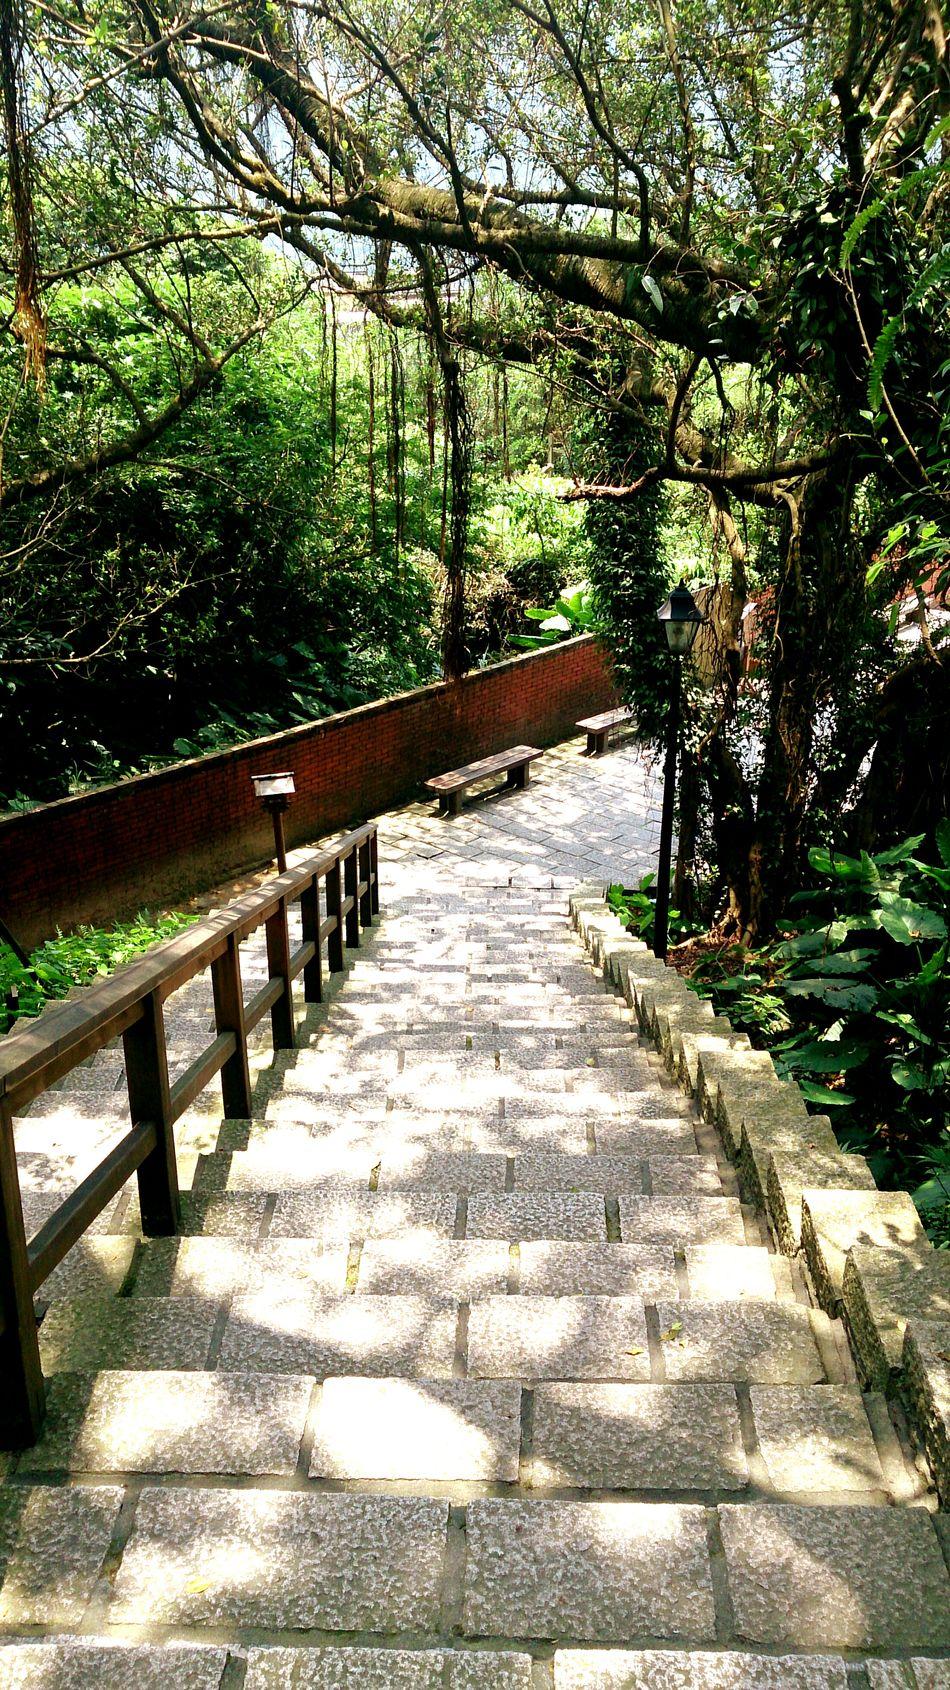 EyeEm Best Shots Enjoying The View Traveling 金瓜石 Trees Relaxing Beautiful Day Ladder